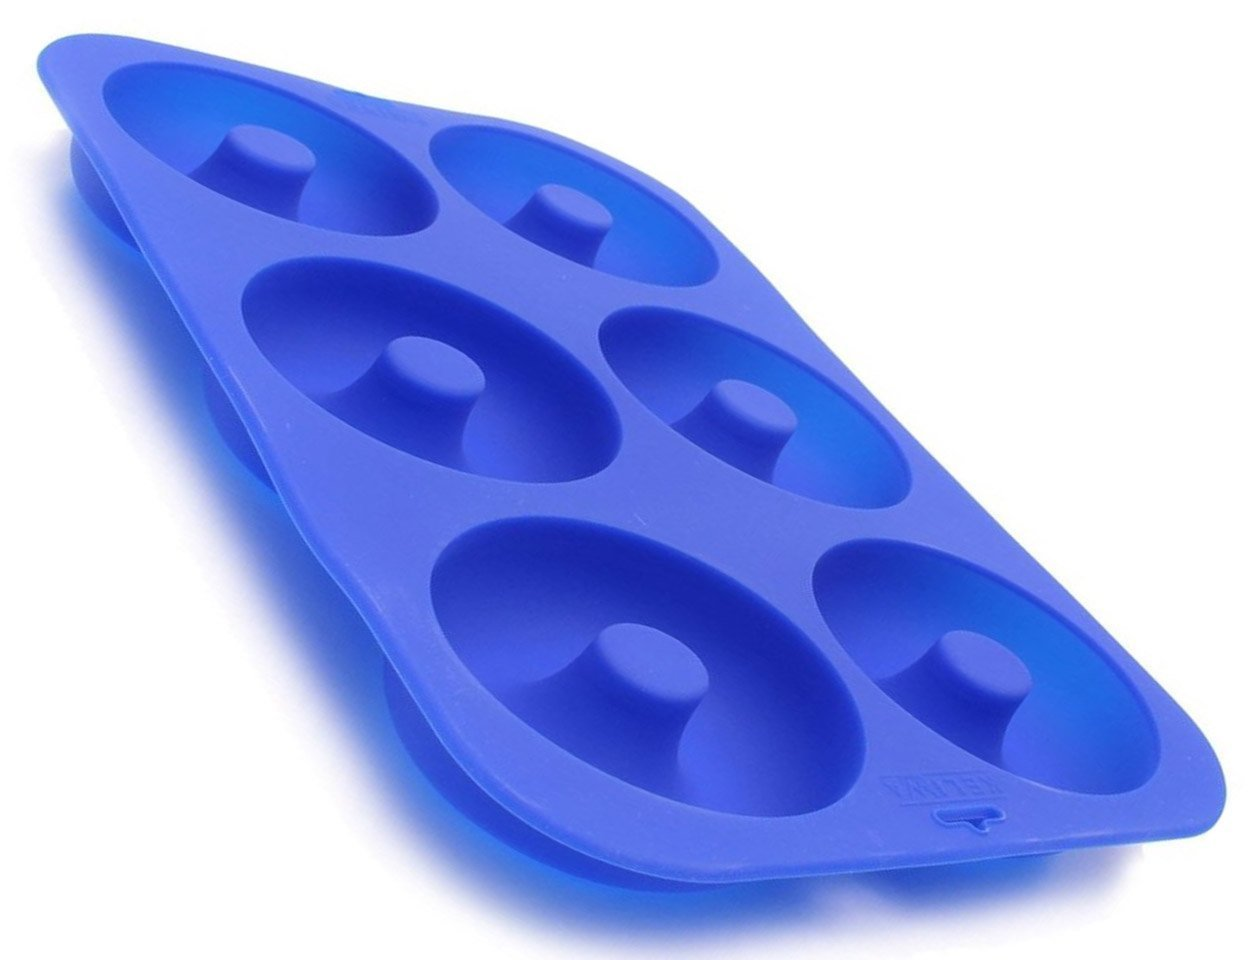 Keliwa Silicone Donut Baking Pan/Non-Stick Donut Mold/Dishwasher, Oven, Microwave, Freezer Safe 636824685071